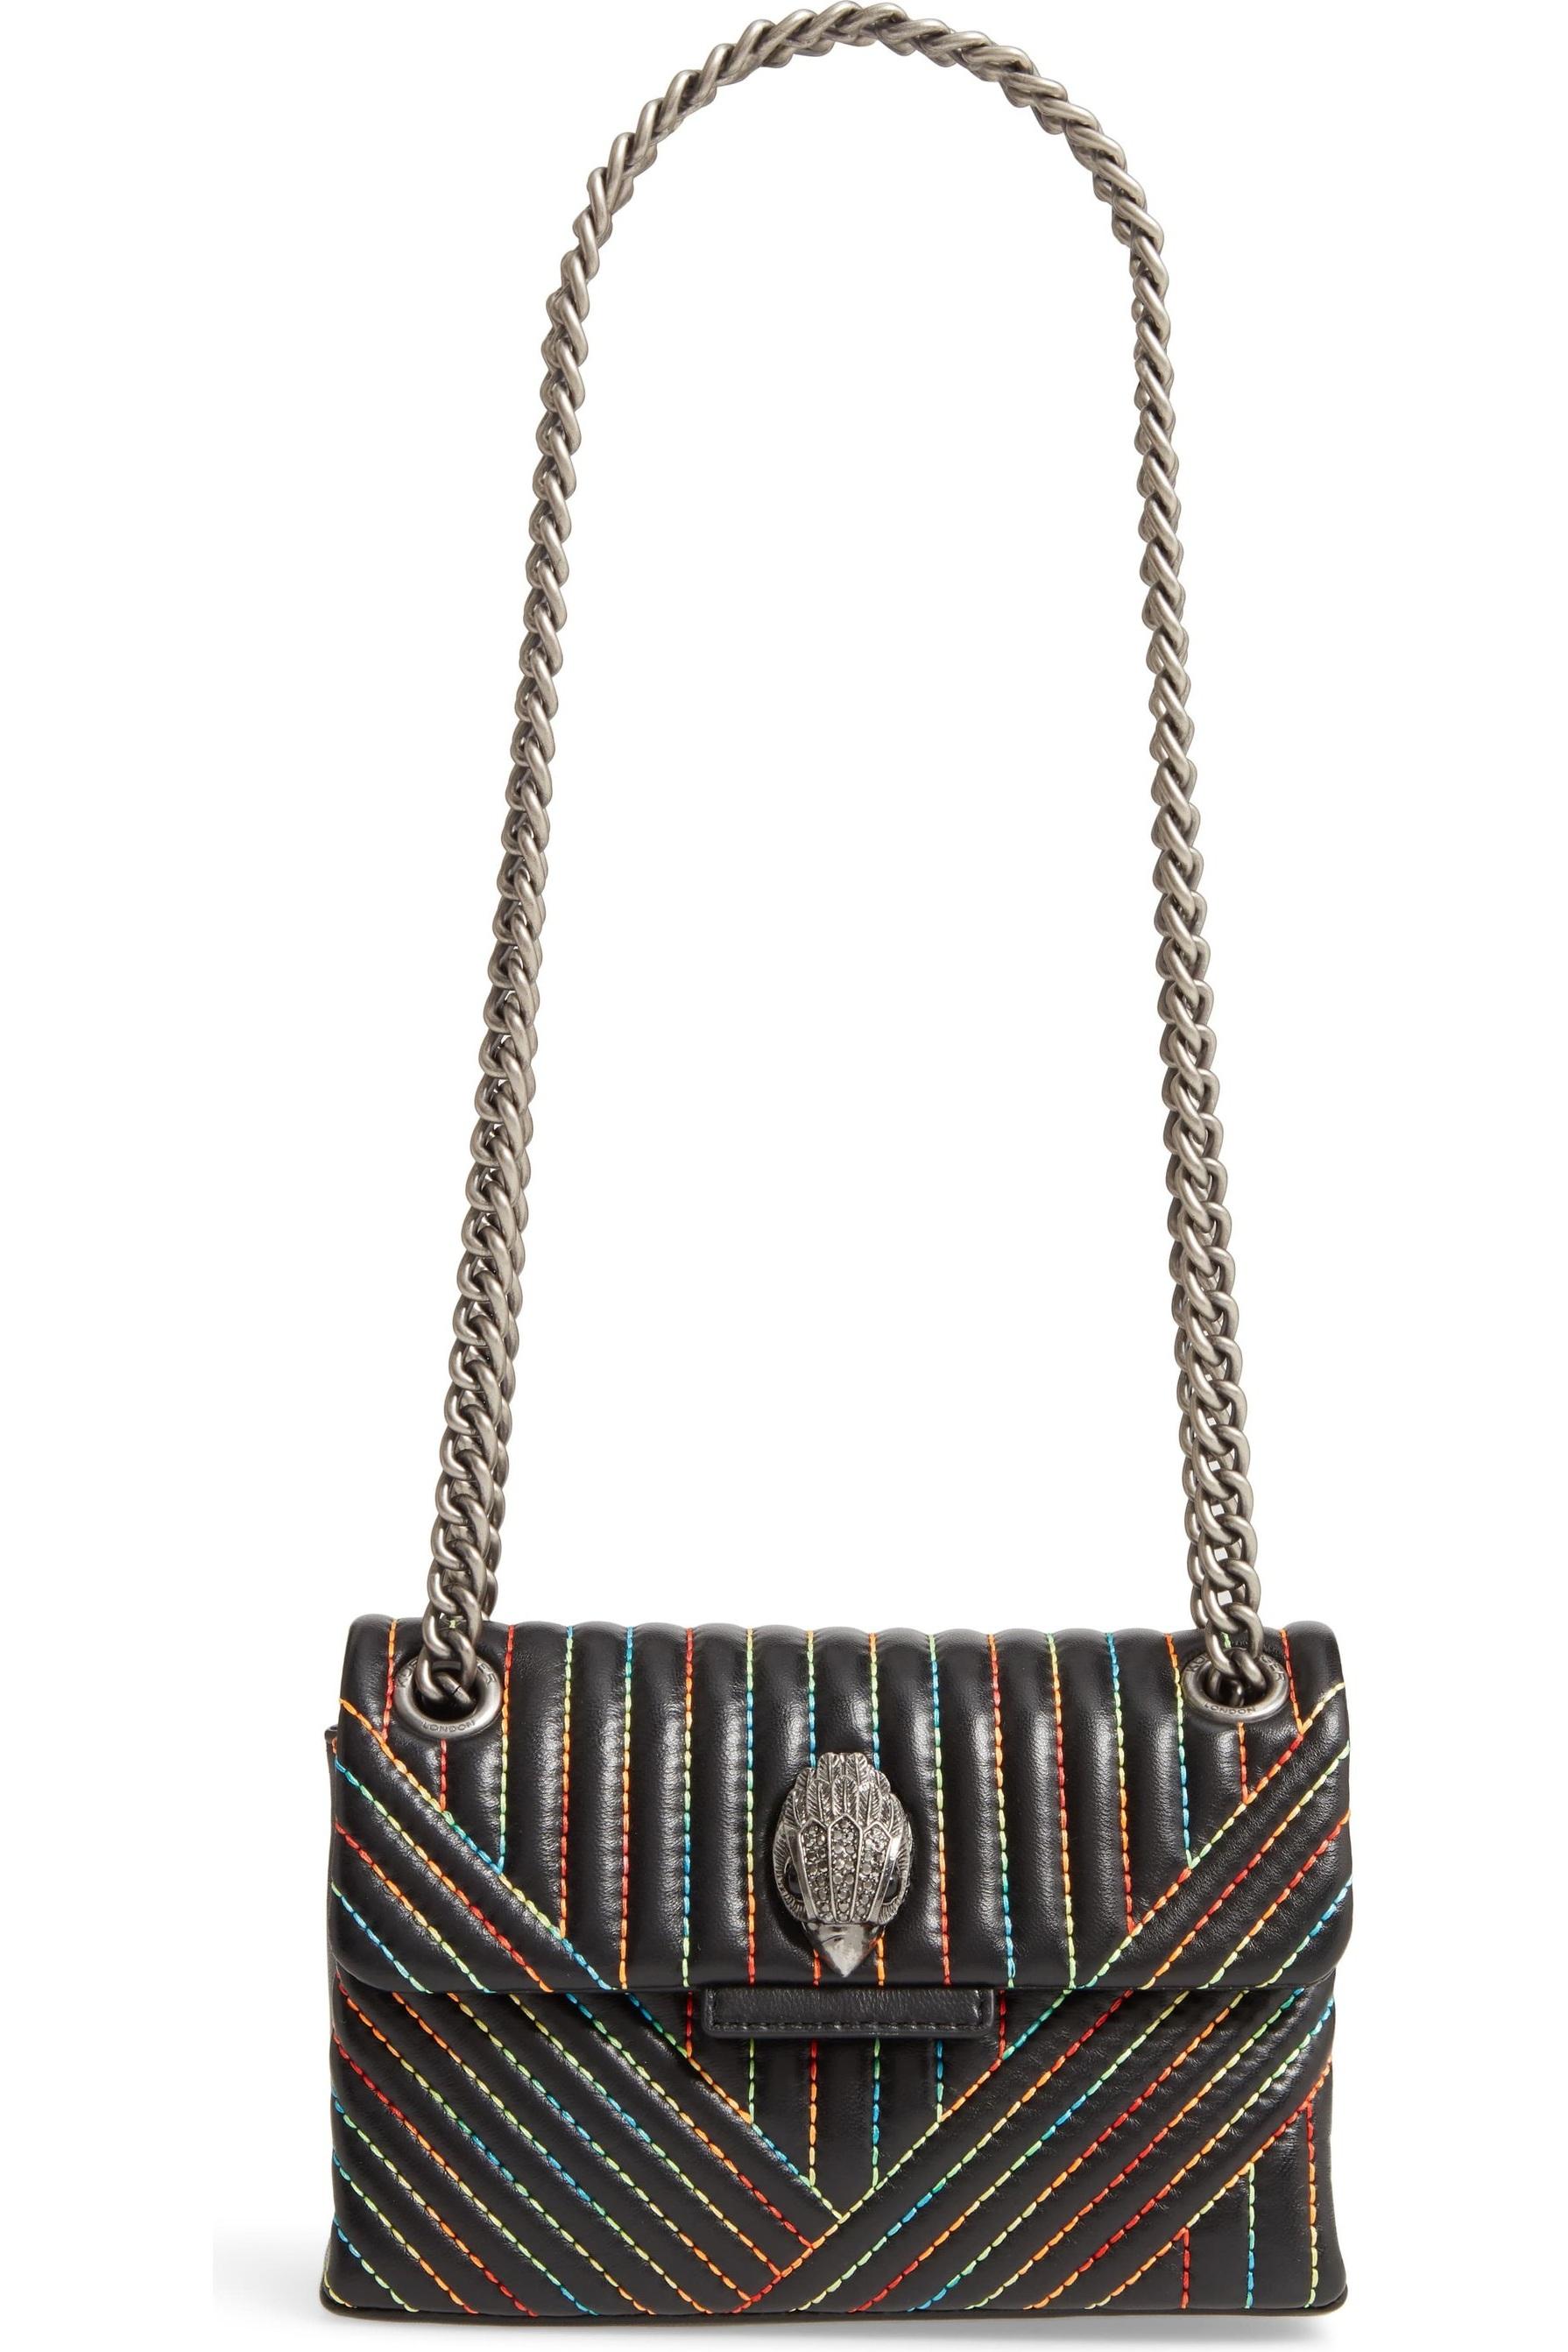 Mini Kensington Leather Crossbody, $165, Nordstrom